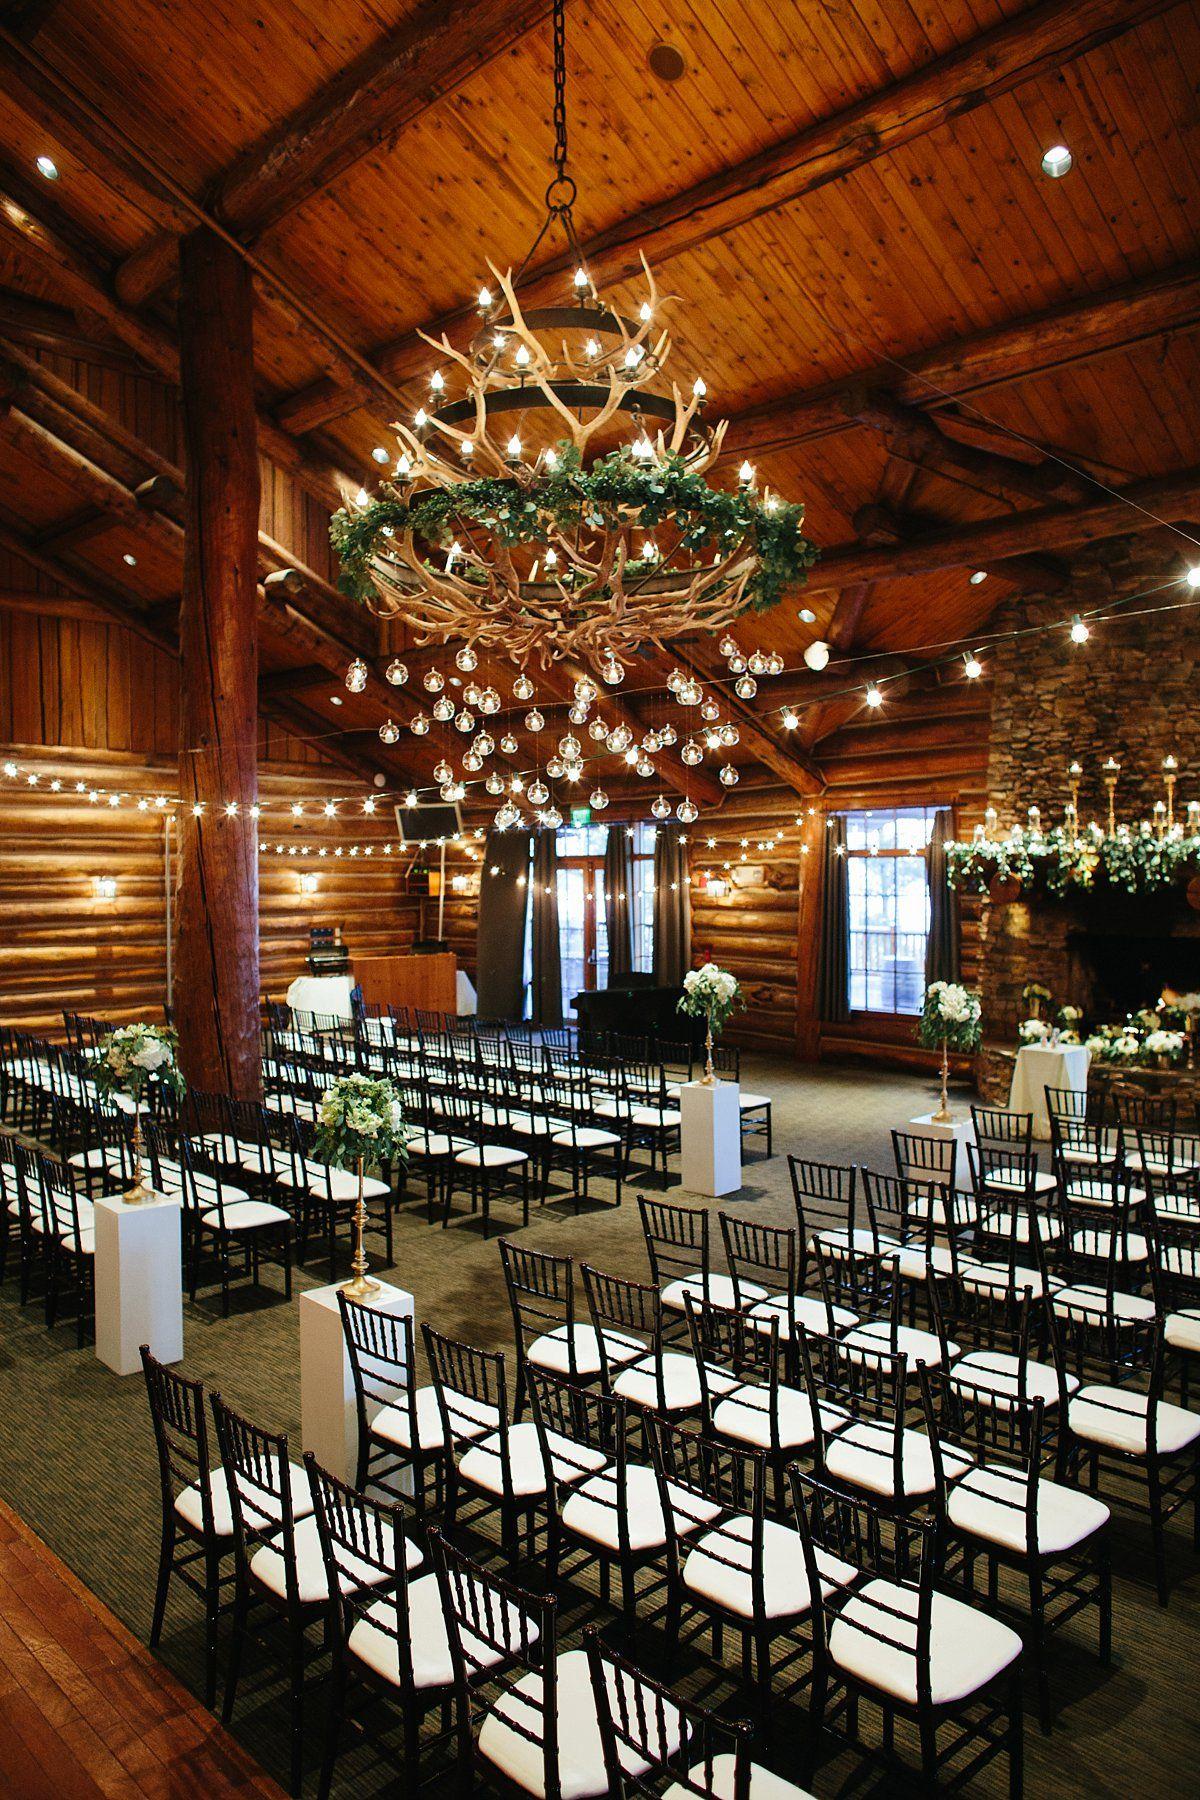 Married Mr And Mrs Grabast Wilderness Ridge Lincoln Ne The Leekers Photography Theleekers Com Nebraska Wedding Winter Wedding Dream Wedding